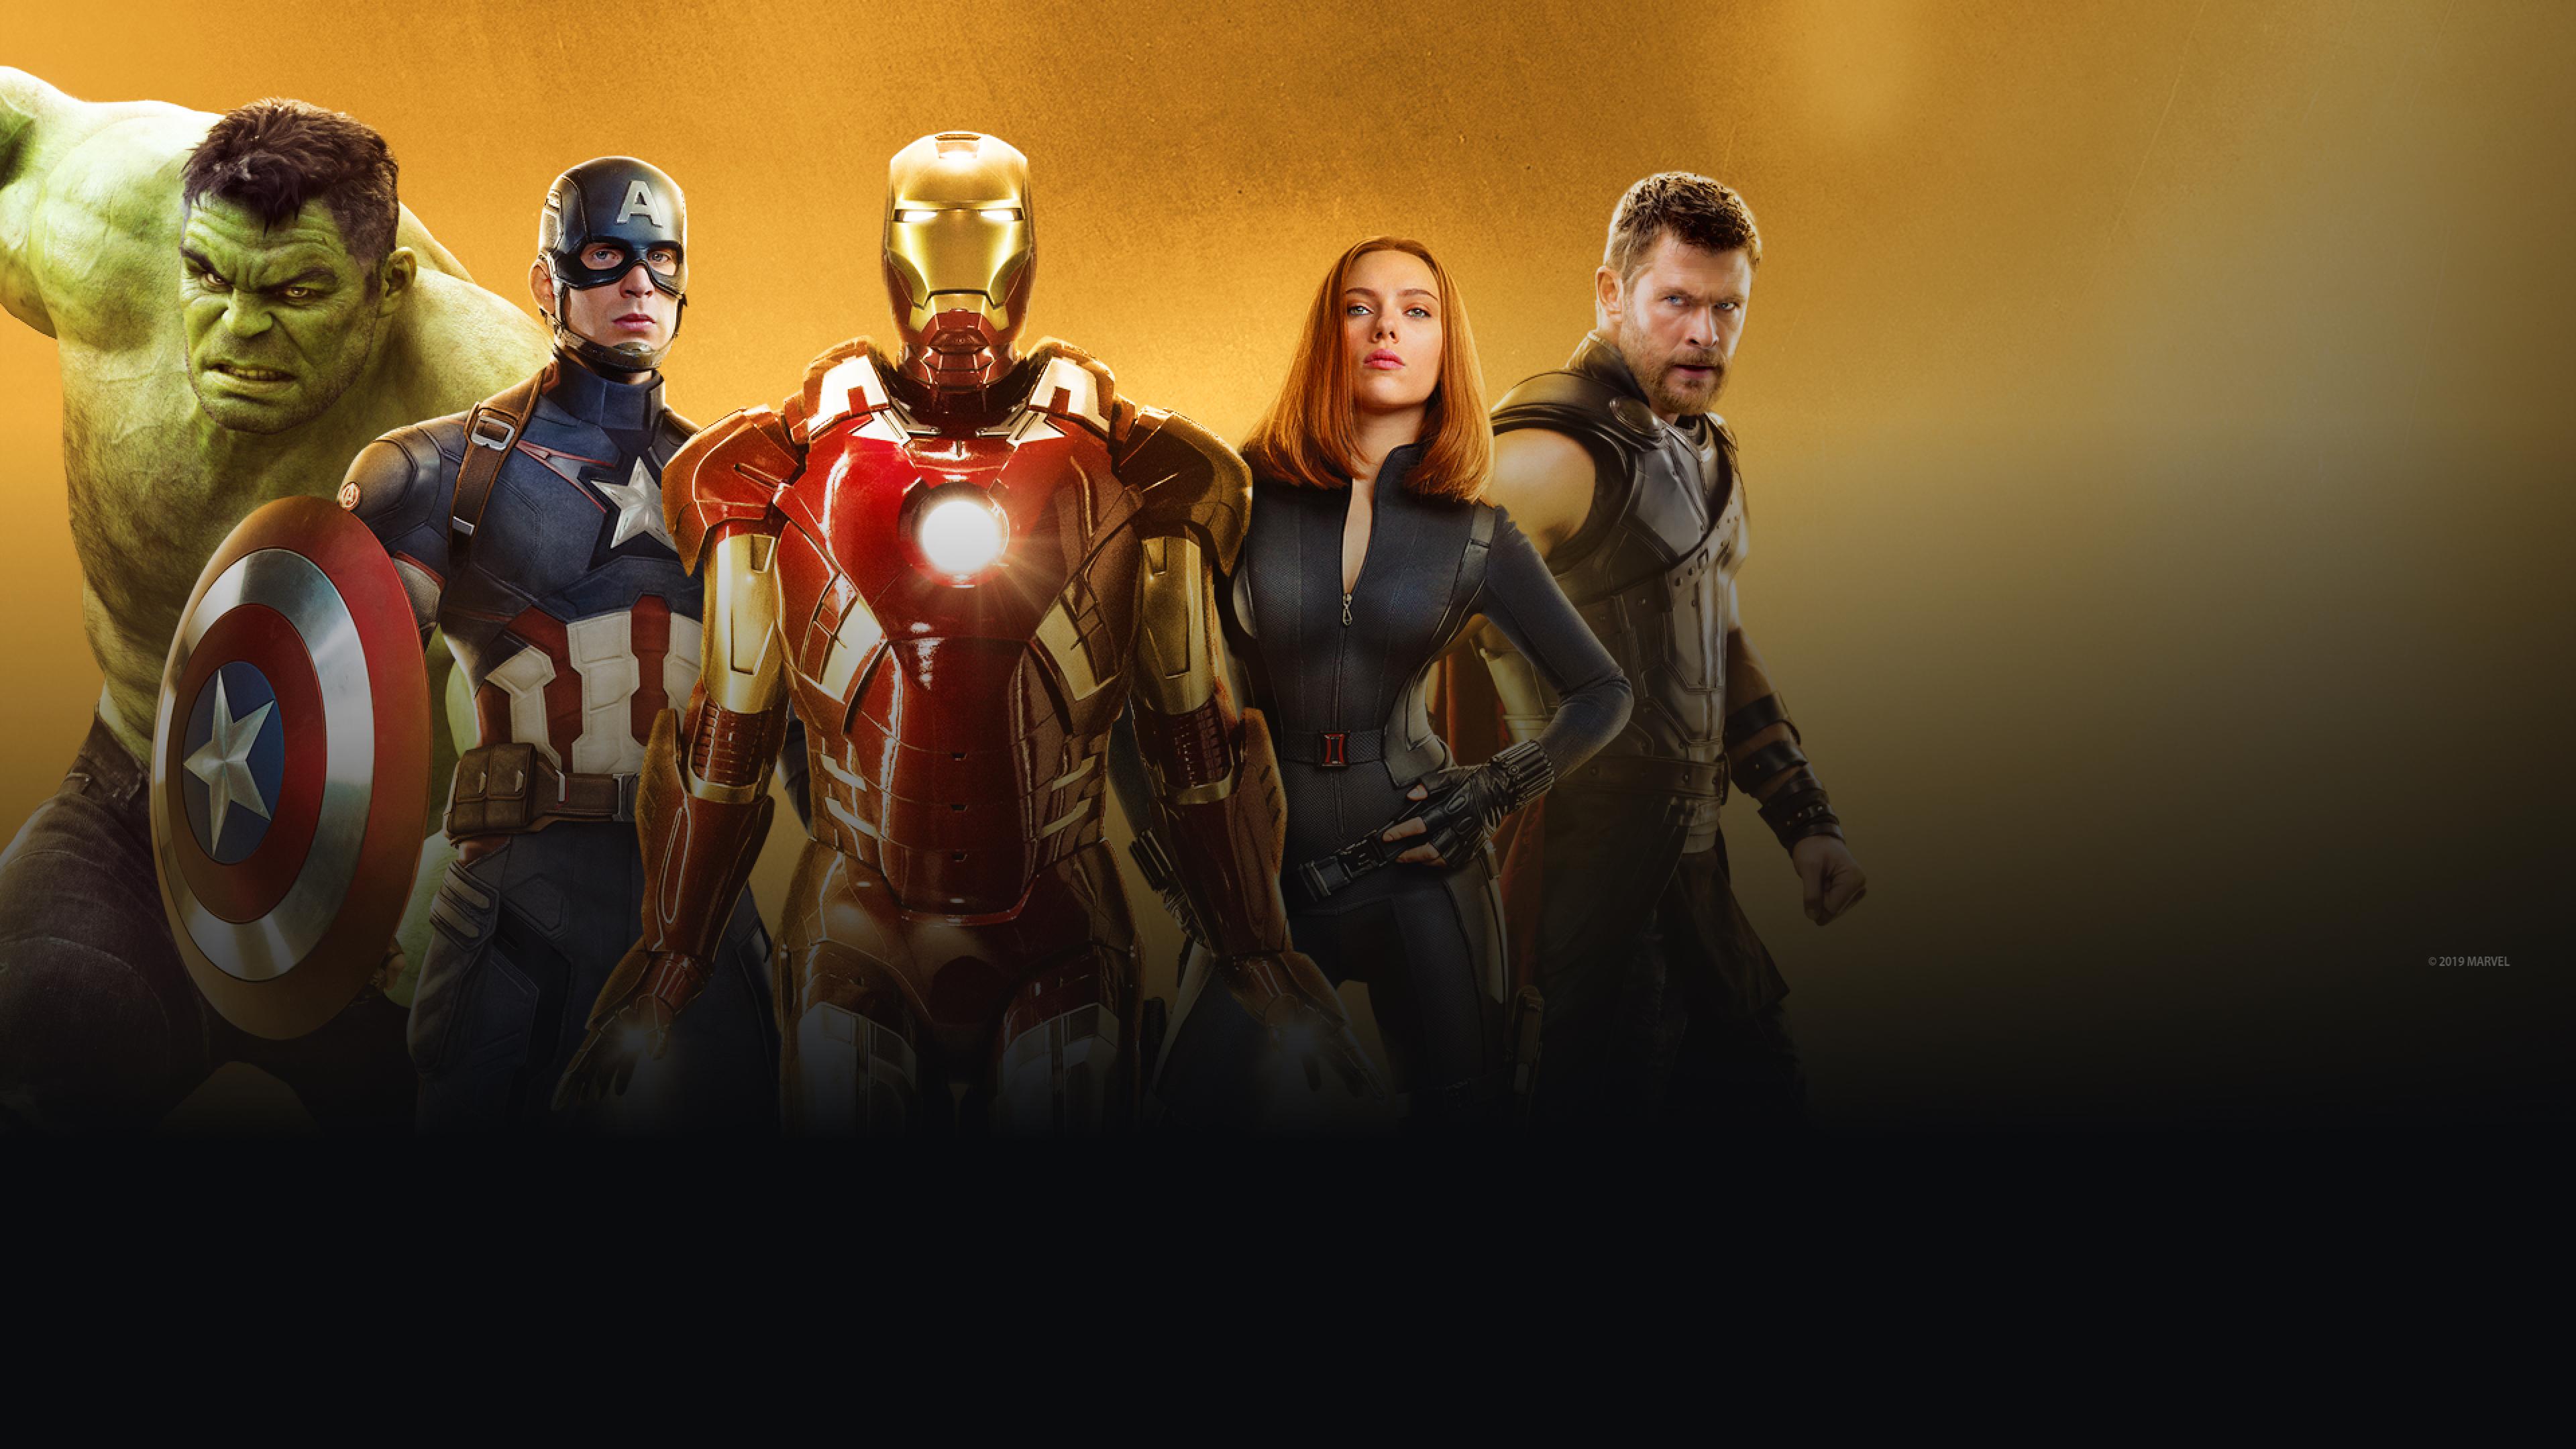 Wallpaper 4k Avengers Infinity War 4k 4k-wallpapers